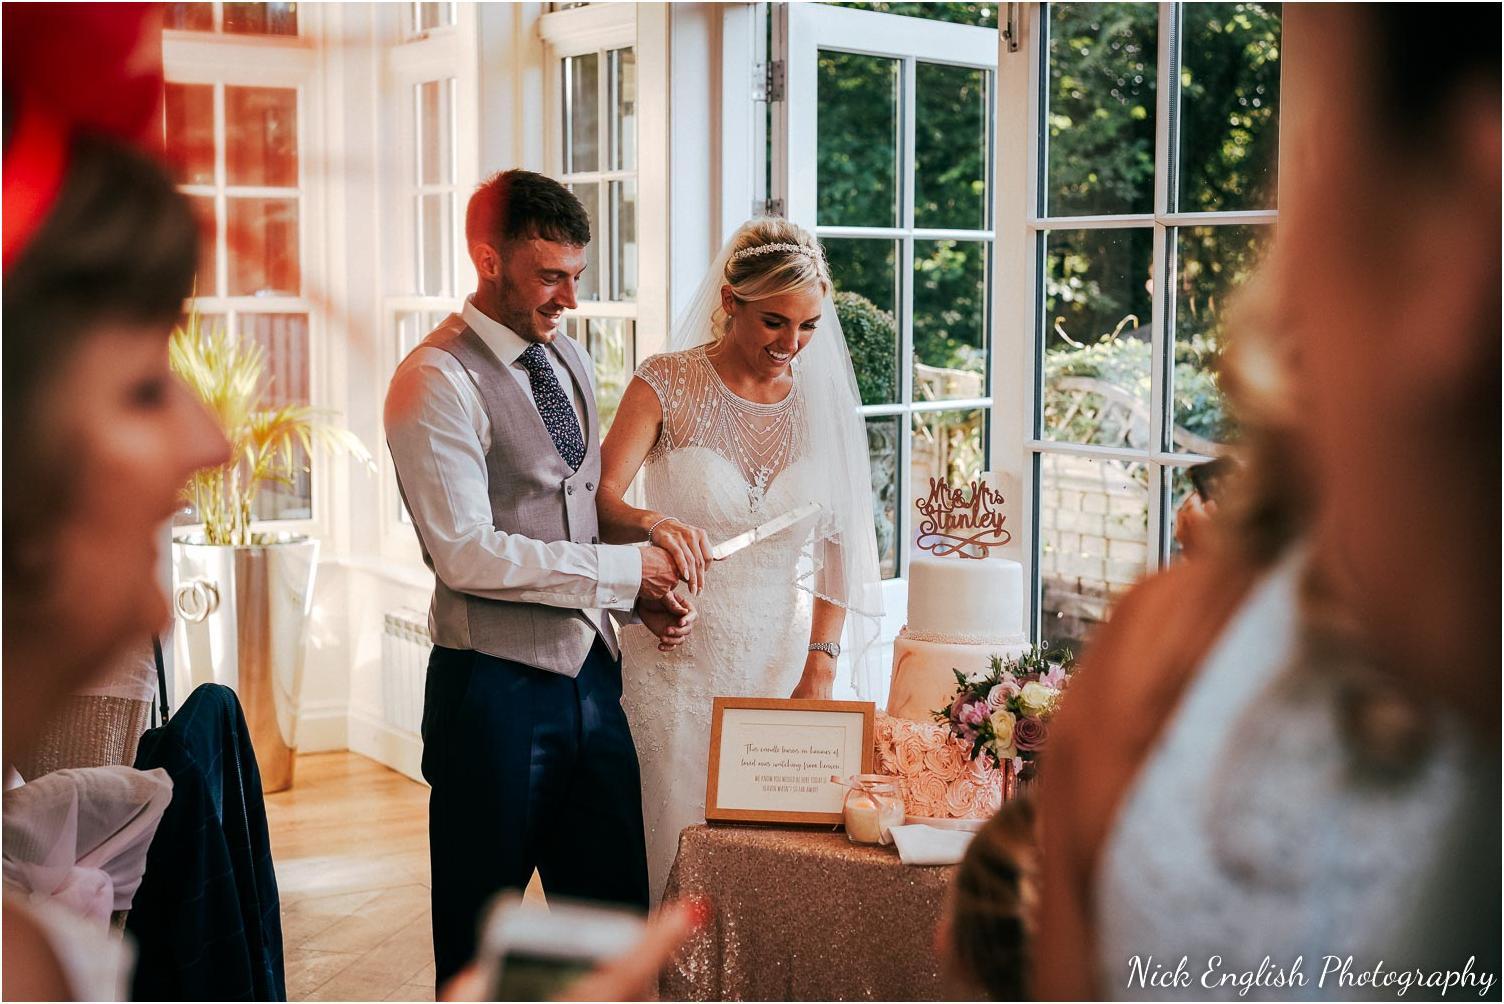 Mitton_Hall_Wedding_Photograph-160.jpg